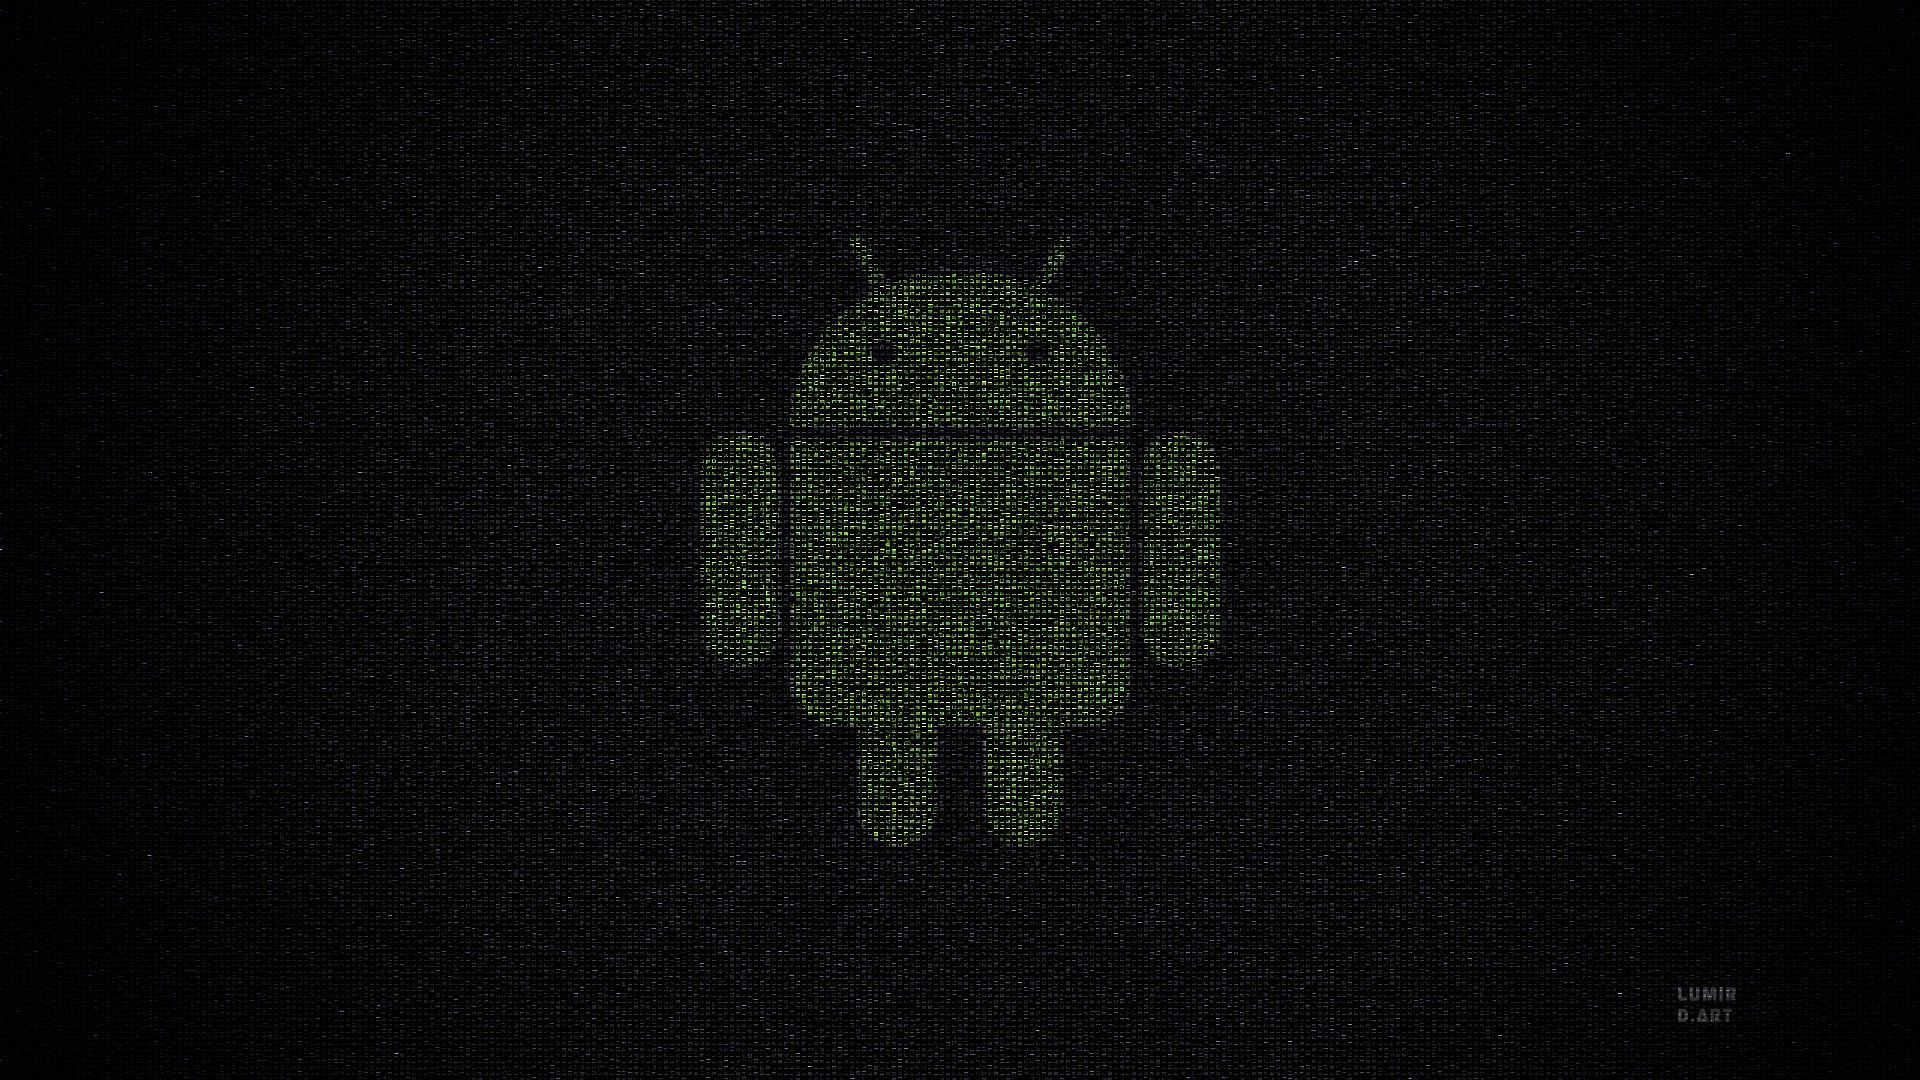 Hacker Pixel